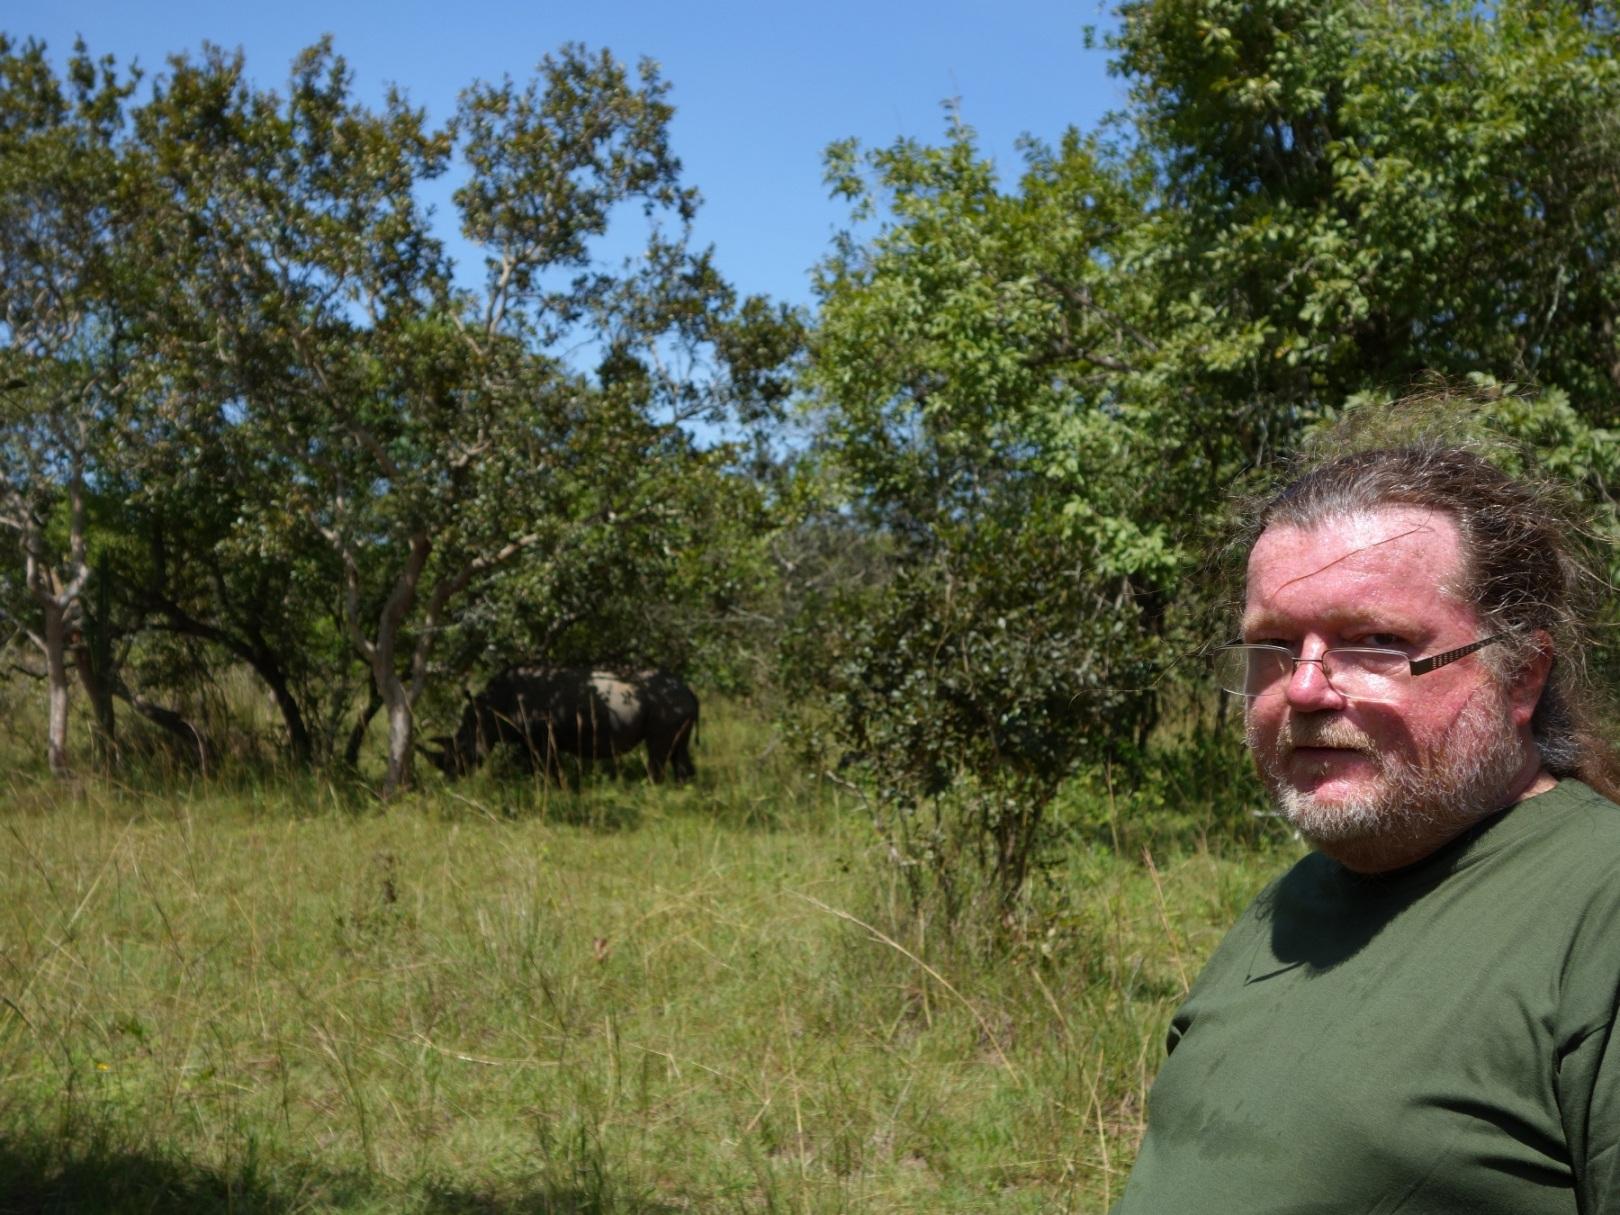 Já a nosorožec - nosorožec vlevo